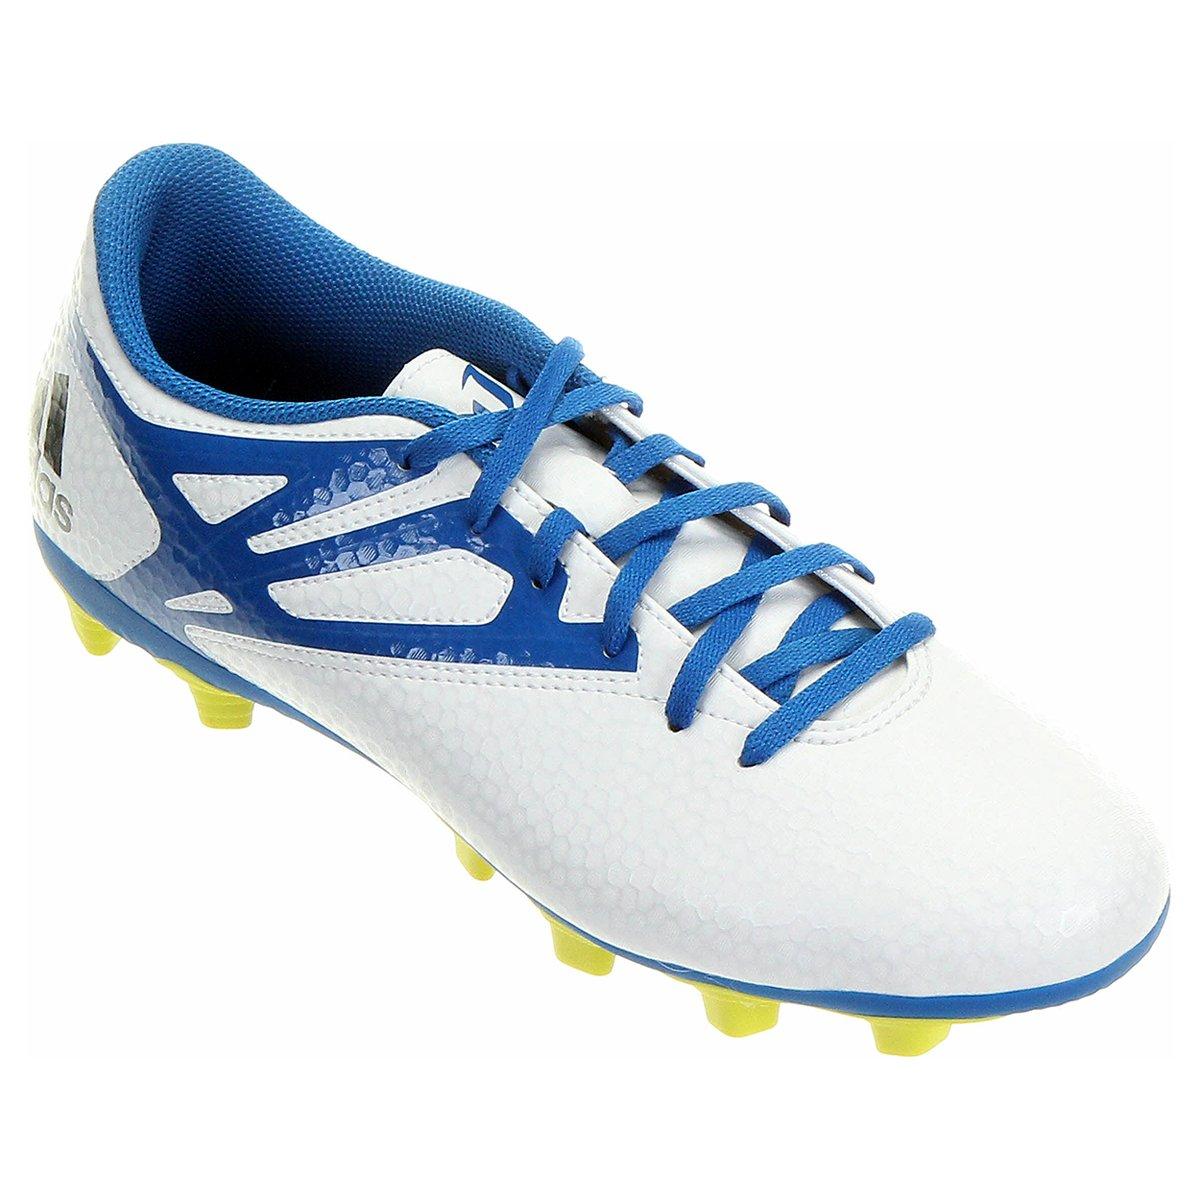 88461a0aee Chuteira Adidas Messi 15.4 FG Campo - Compre Agora